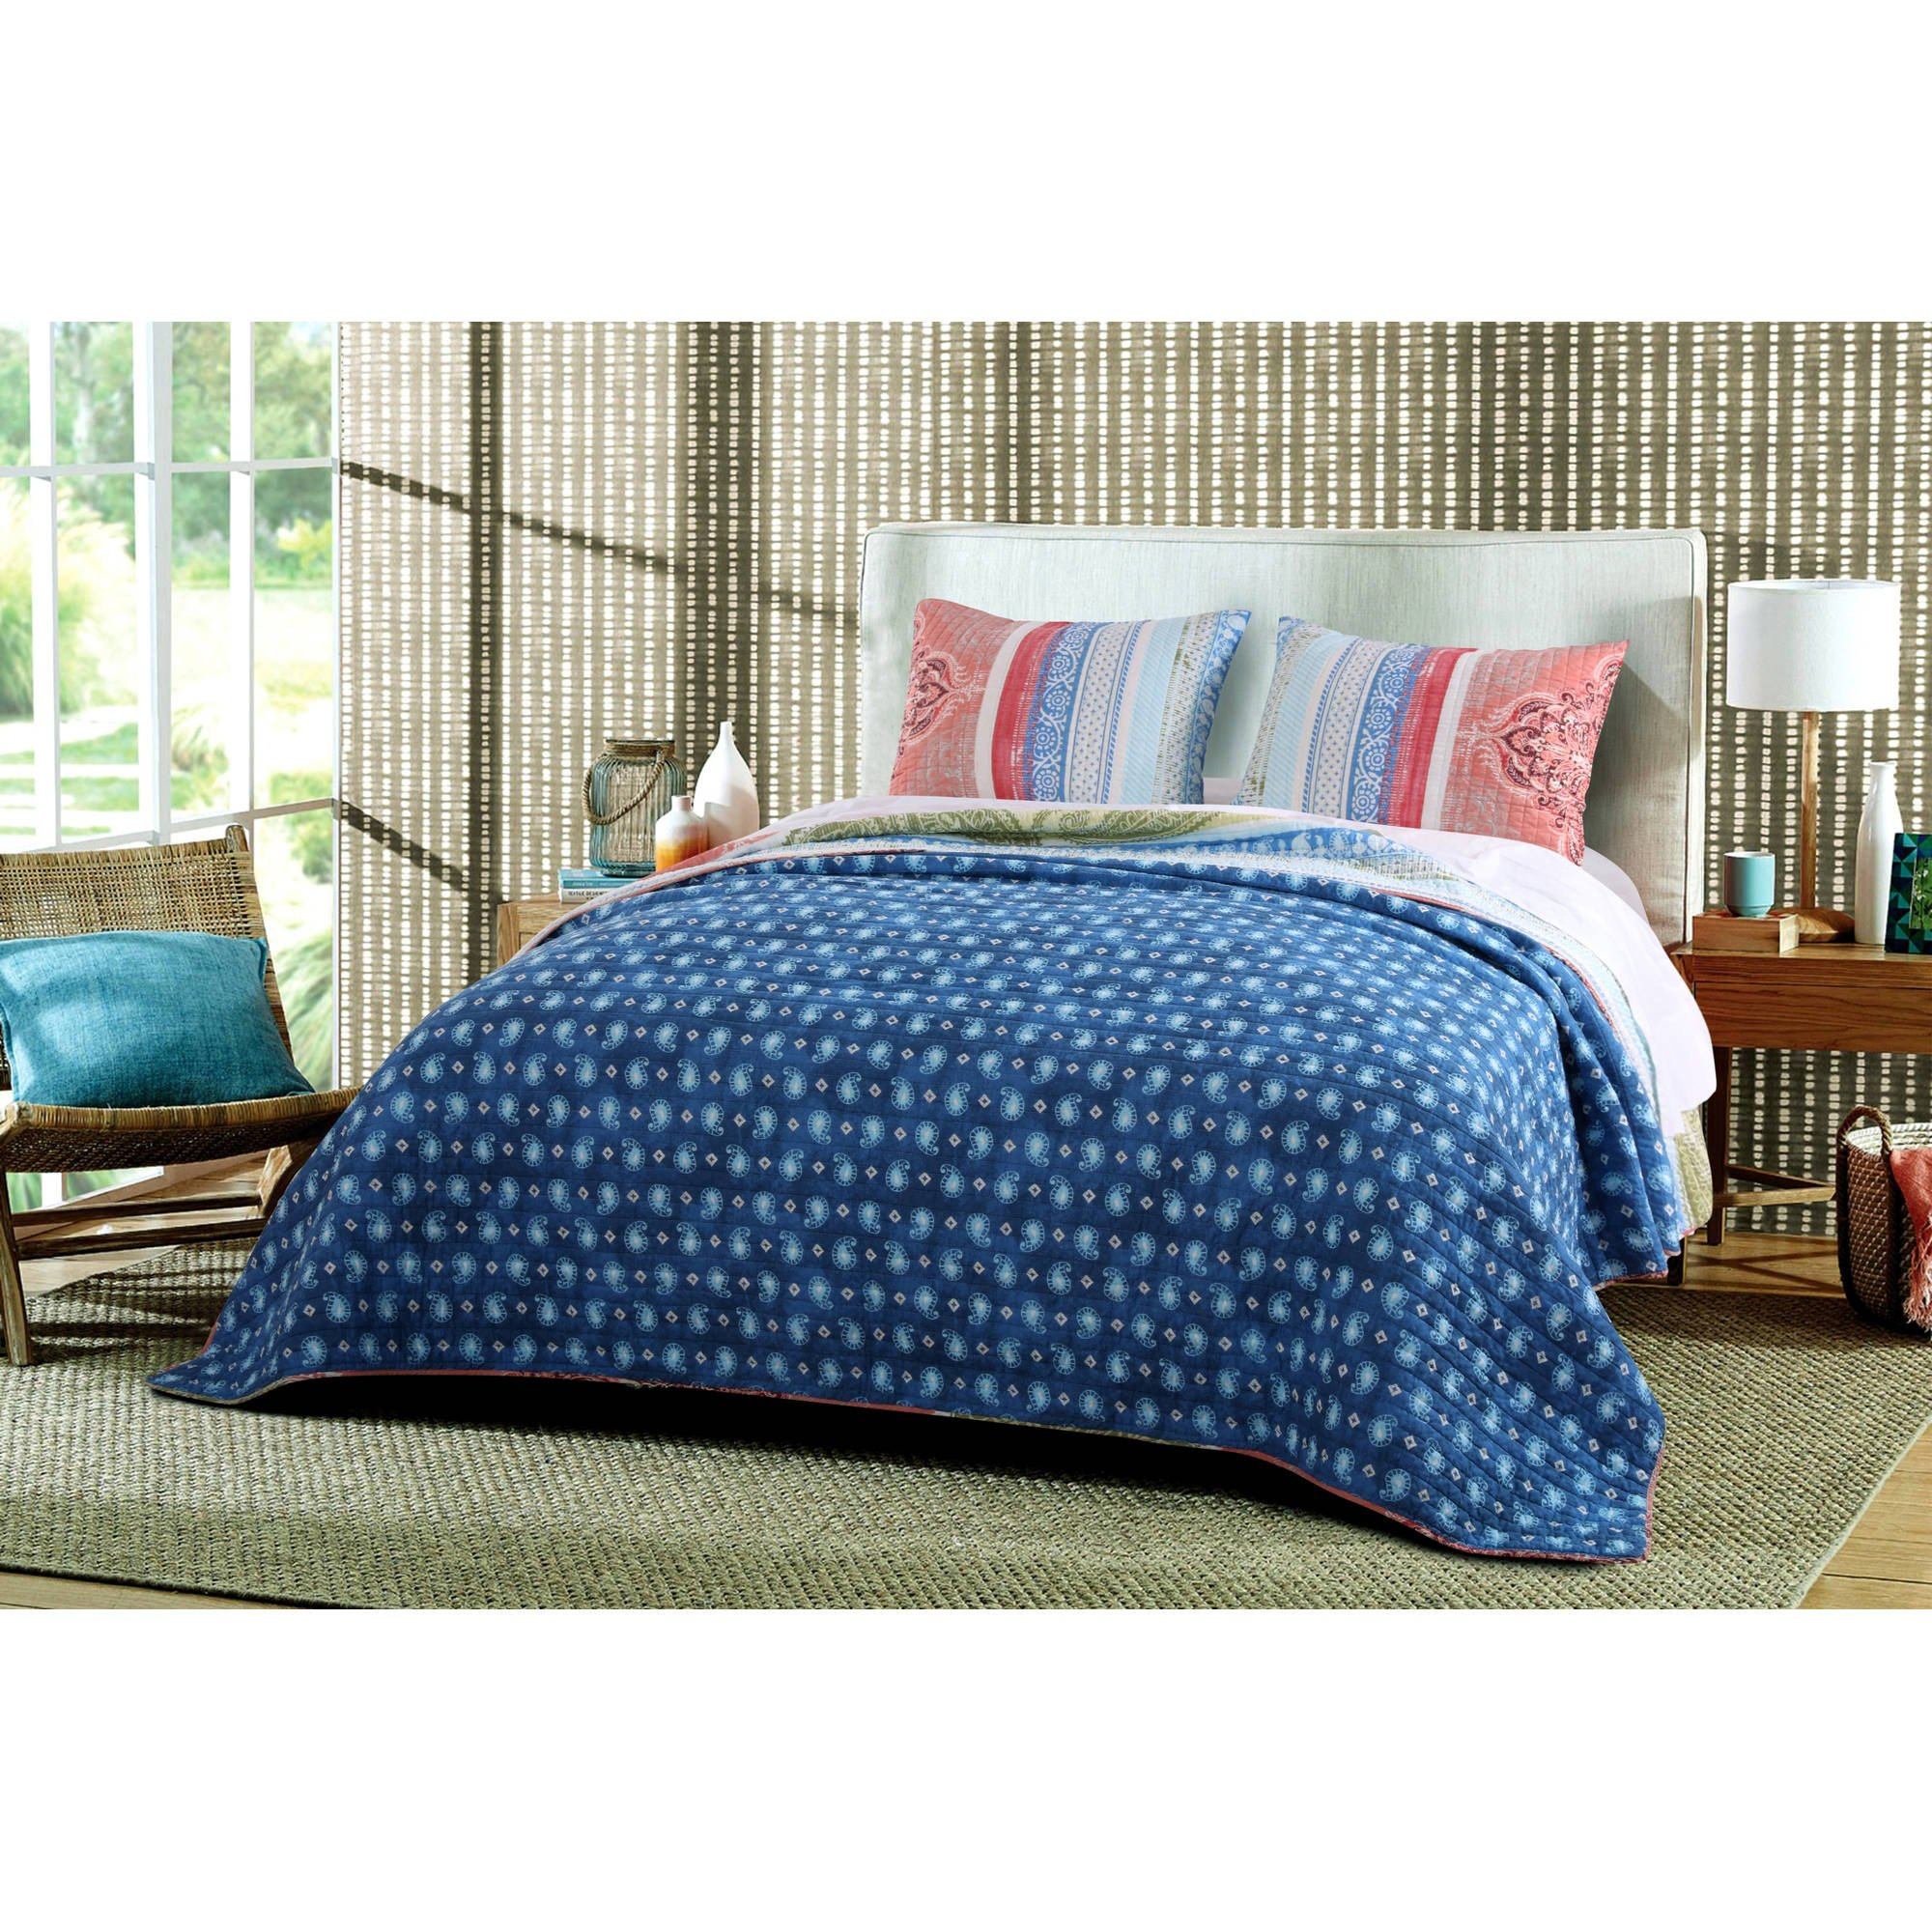 Walmart Bedroom End Tables Elegant Global Trends Hamilton Quilt Set Walmart